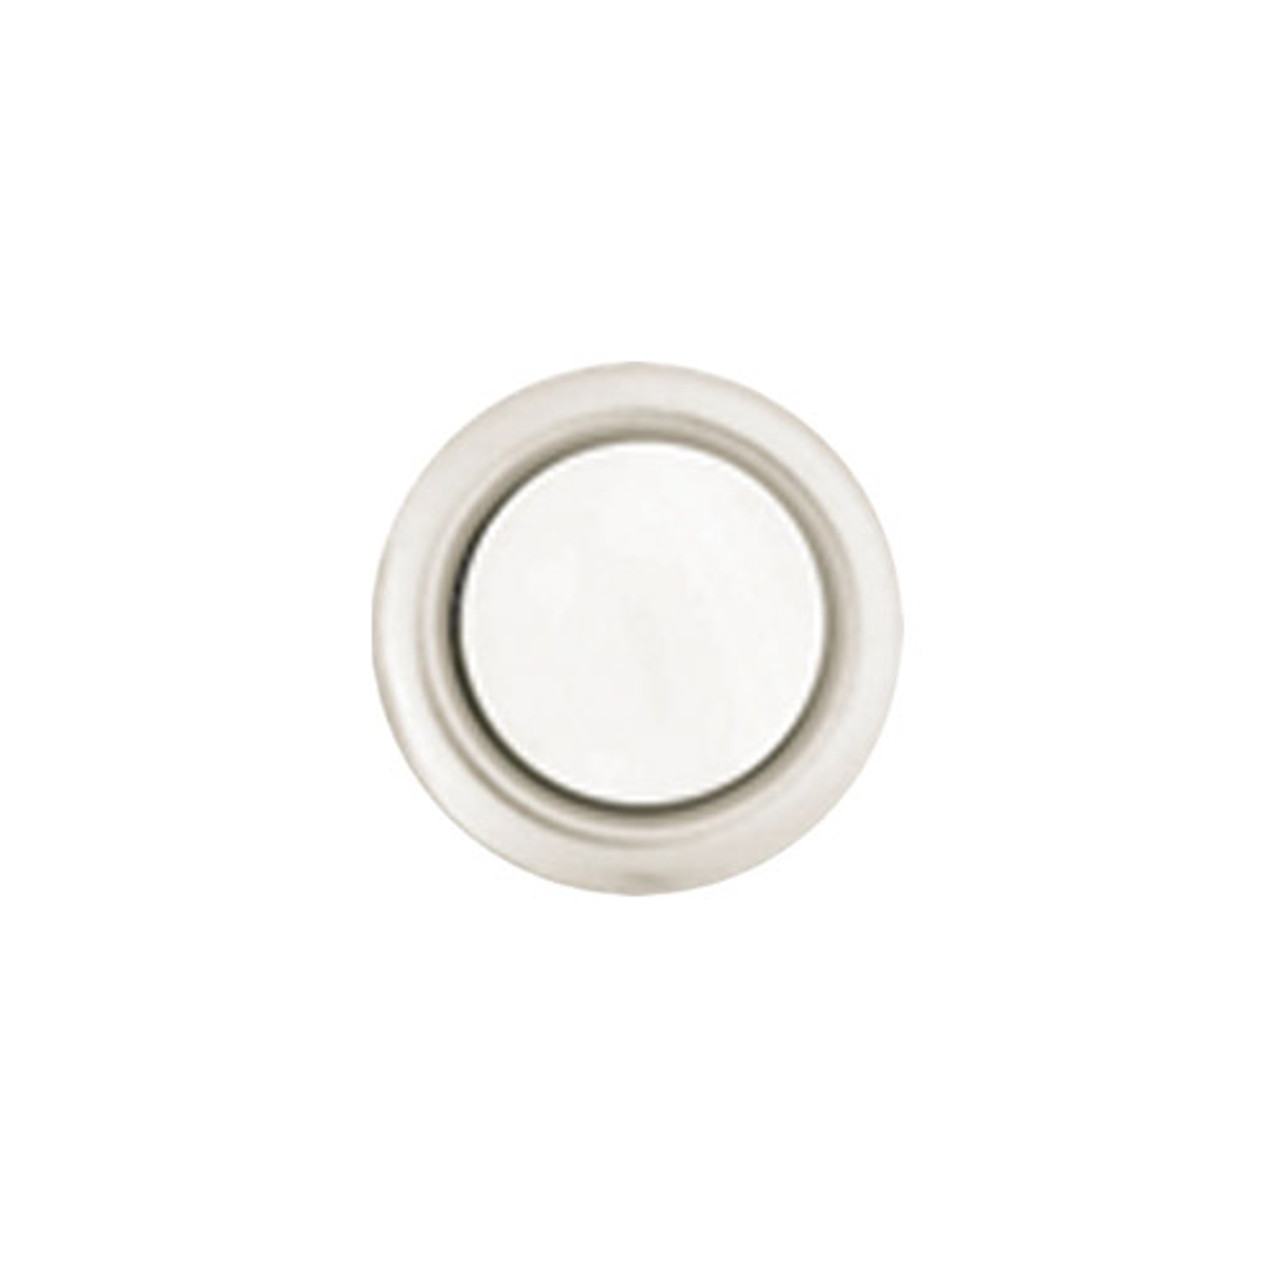 45LA Trine Bell Button Silver Rim with Lighted Pearl Center